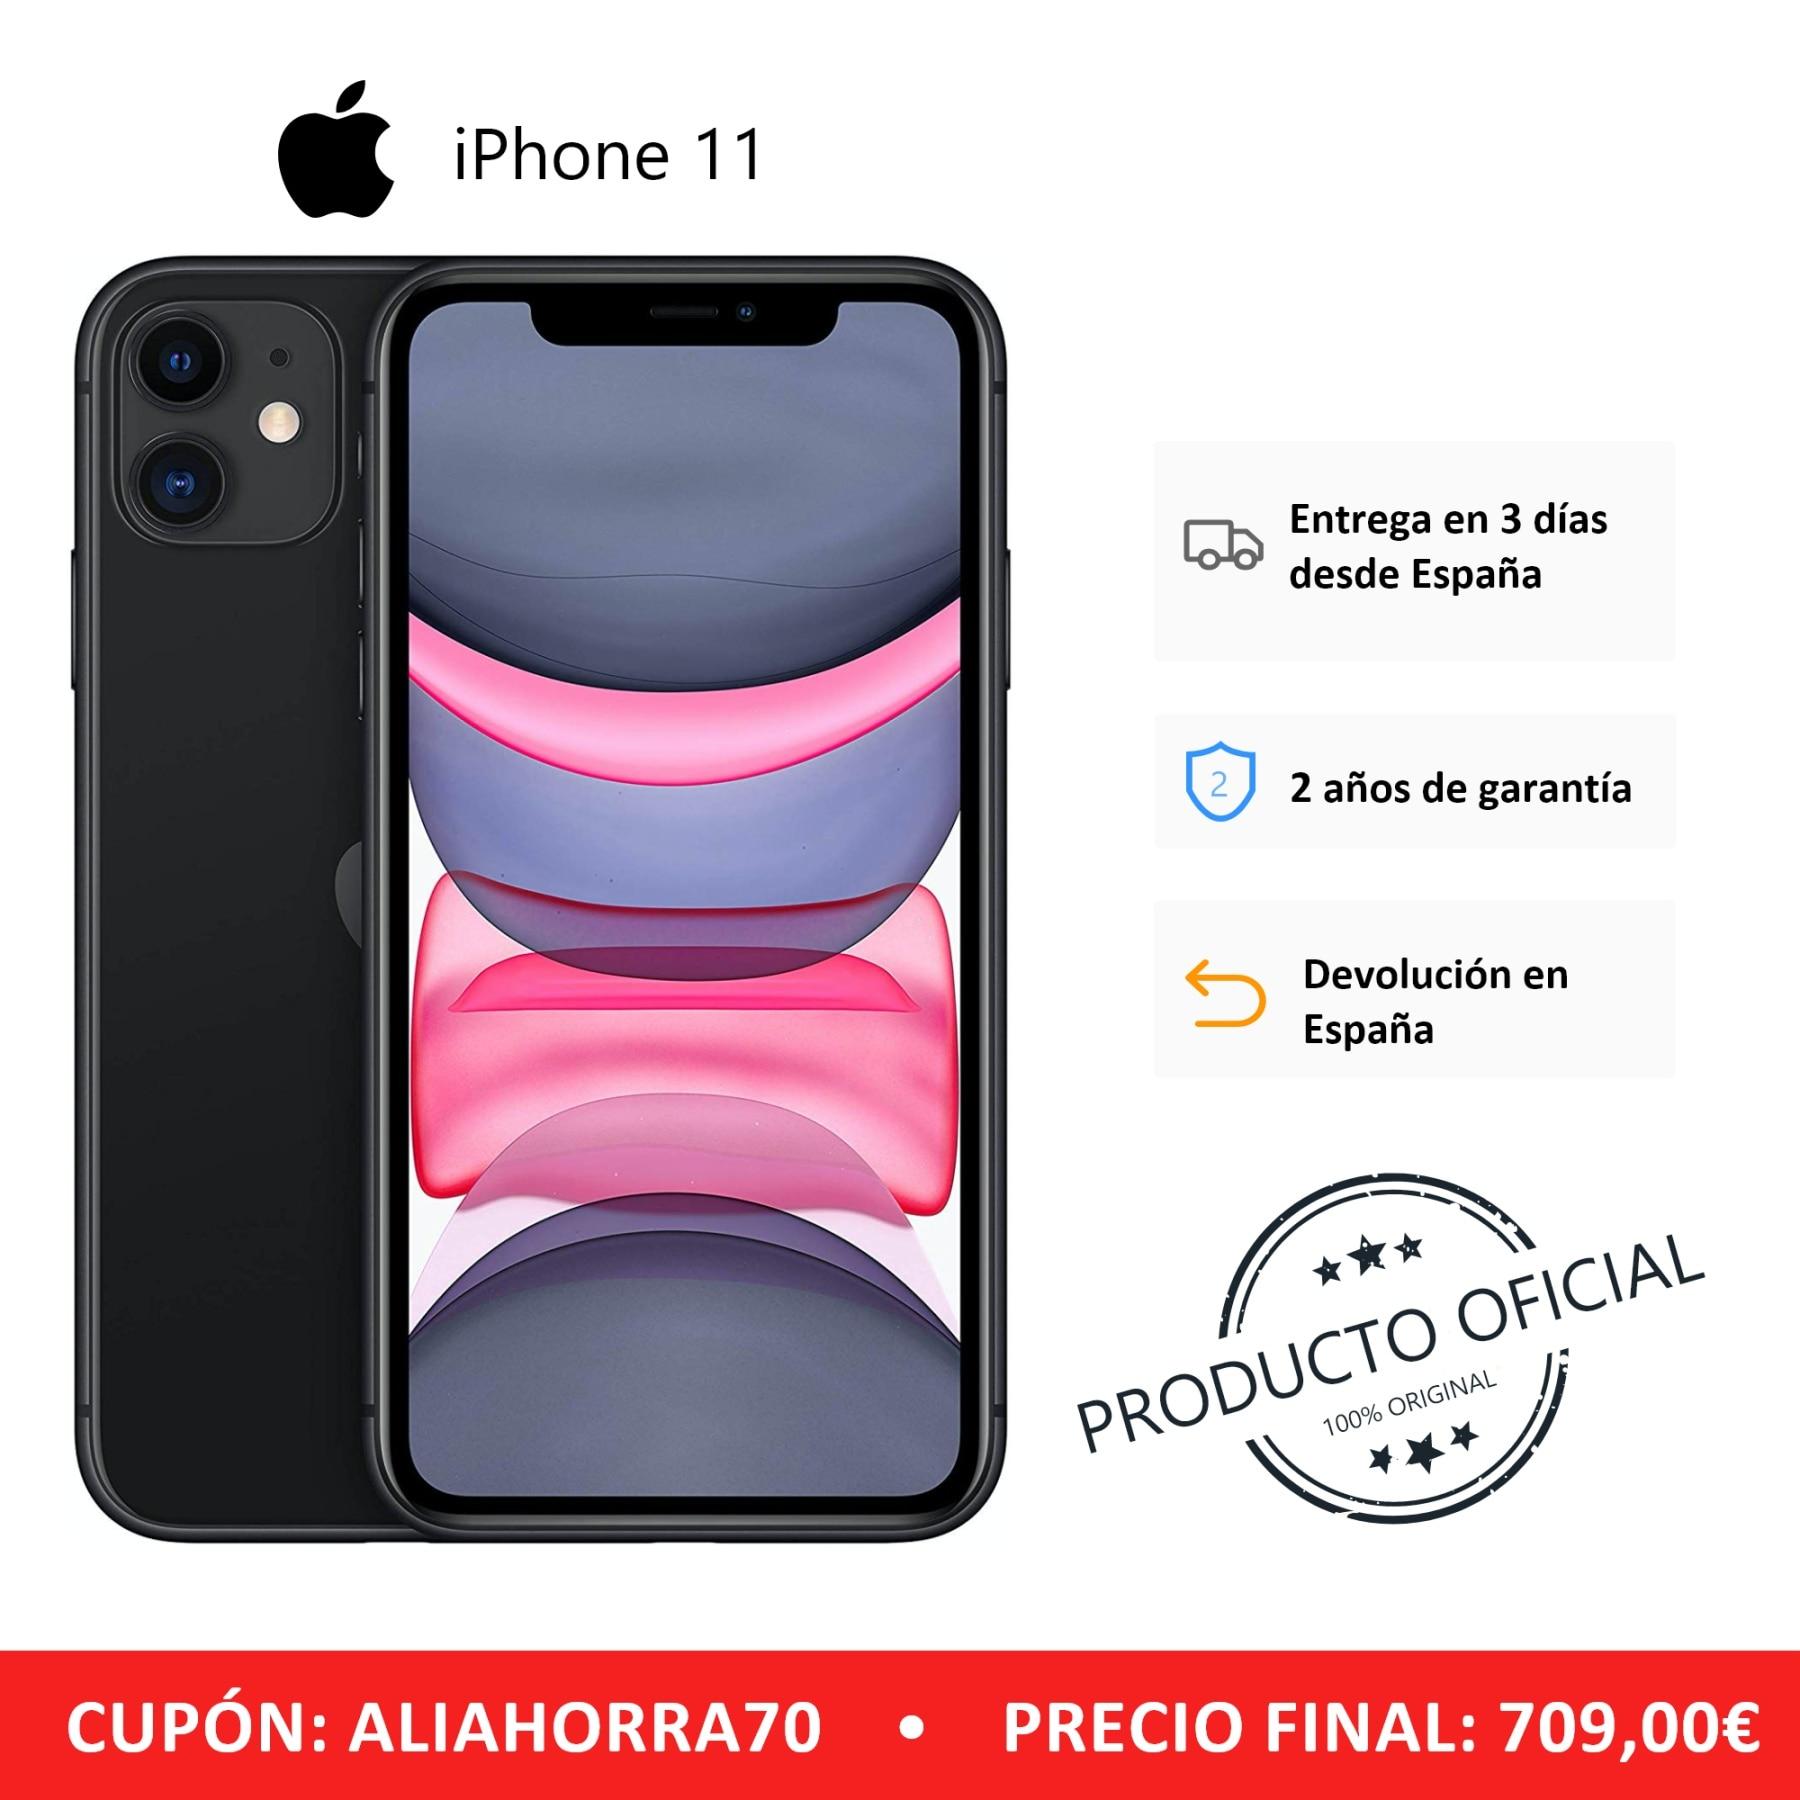 Apple IPhone 11 Smartphone (64 GB ROM, 4 GB RAM, Black Color, 12 MP Rear Camera, 12 MP Selfie Camera, 6.1